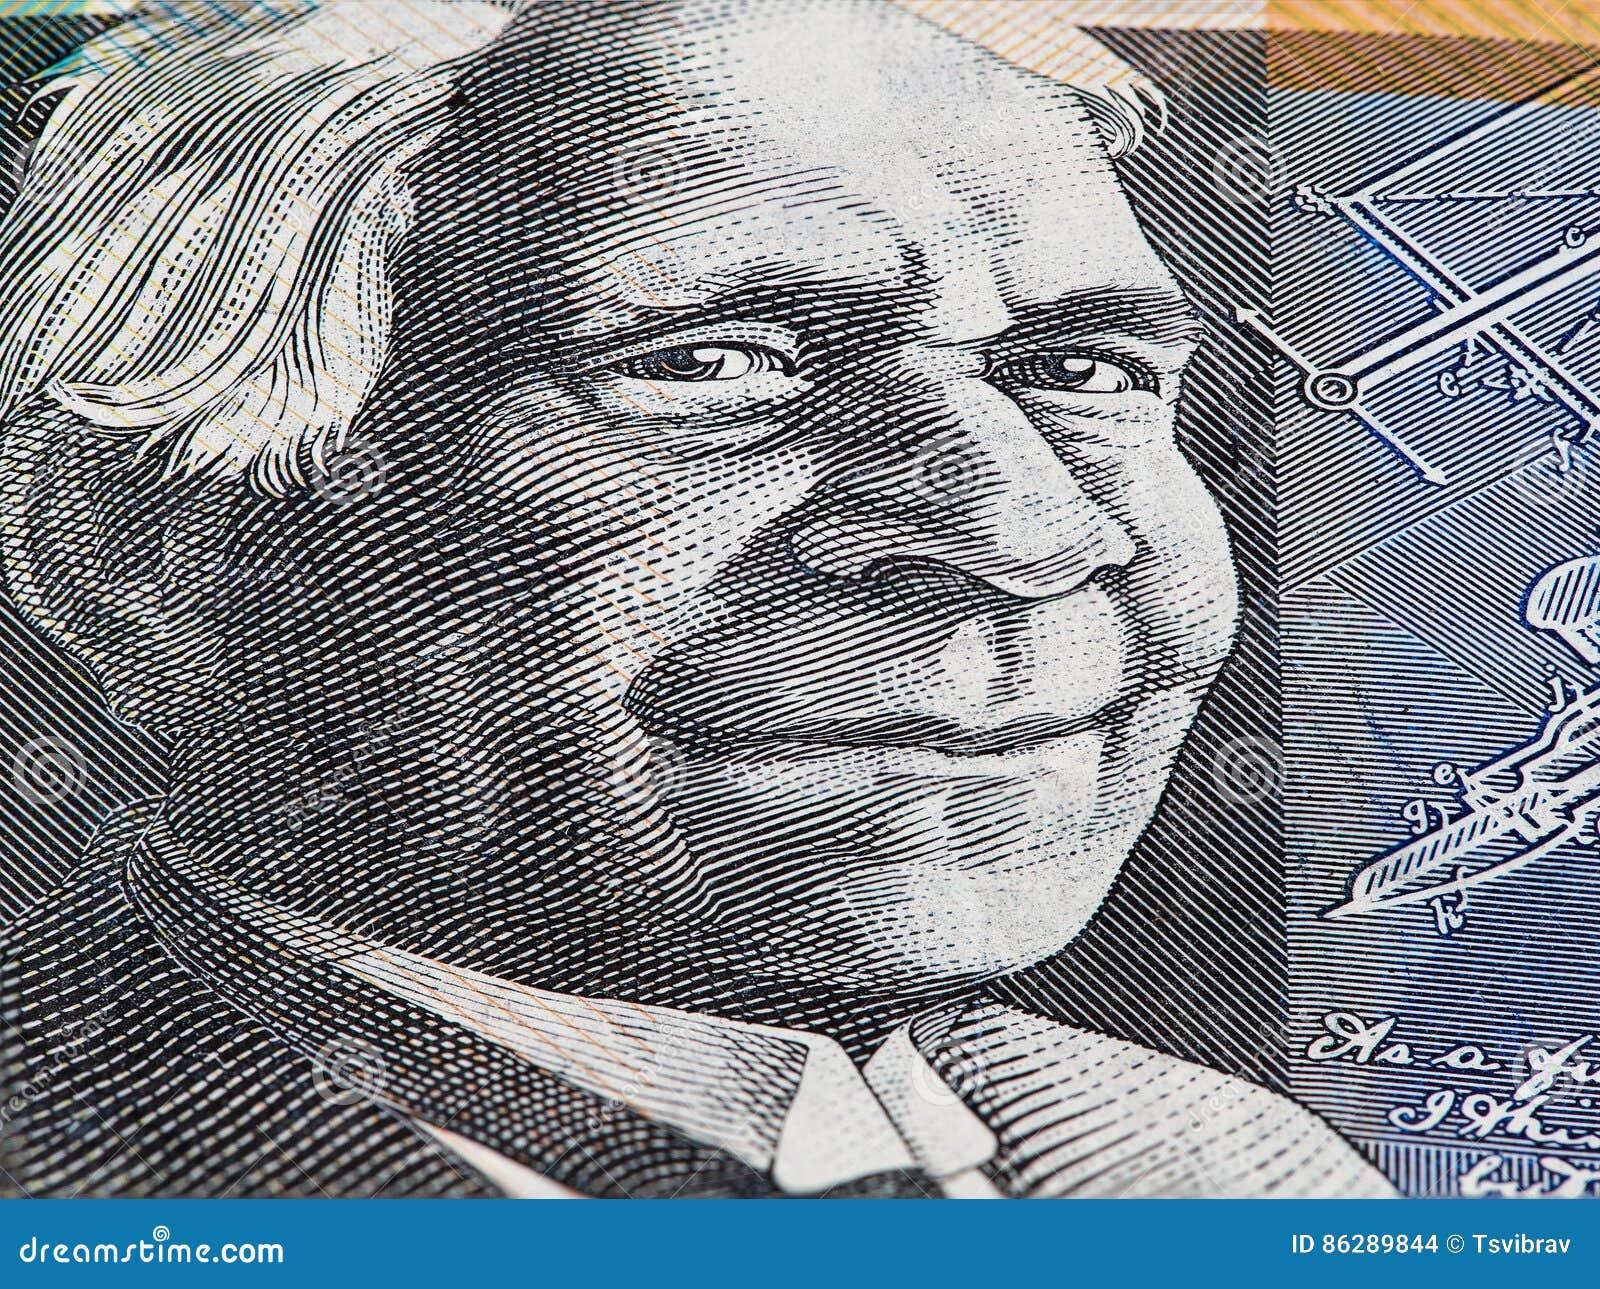 Australian 50 dollar bill macro - portrait of David Unaipon closeup.